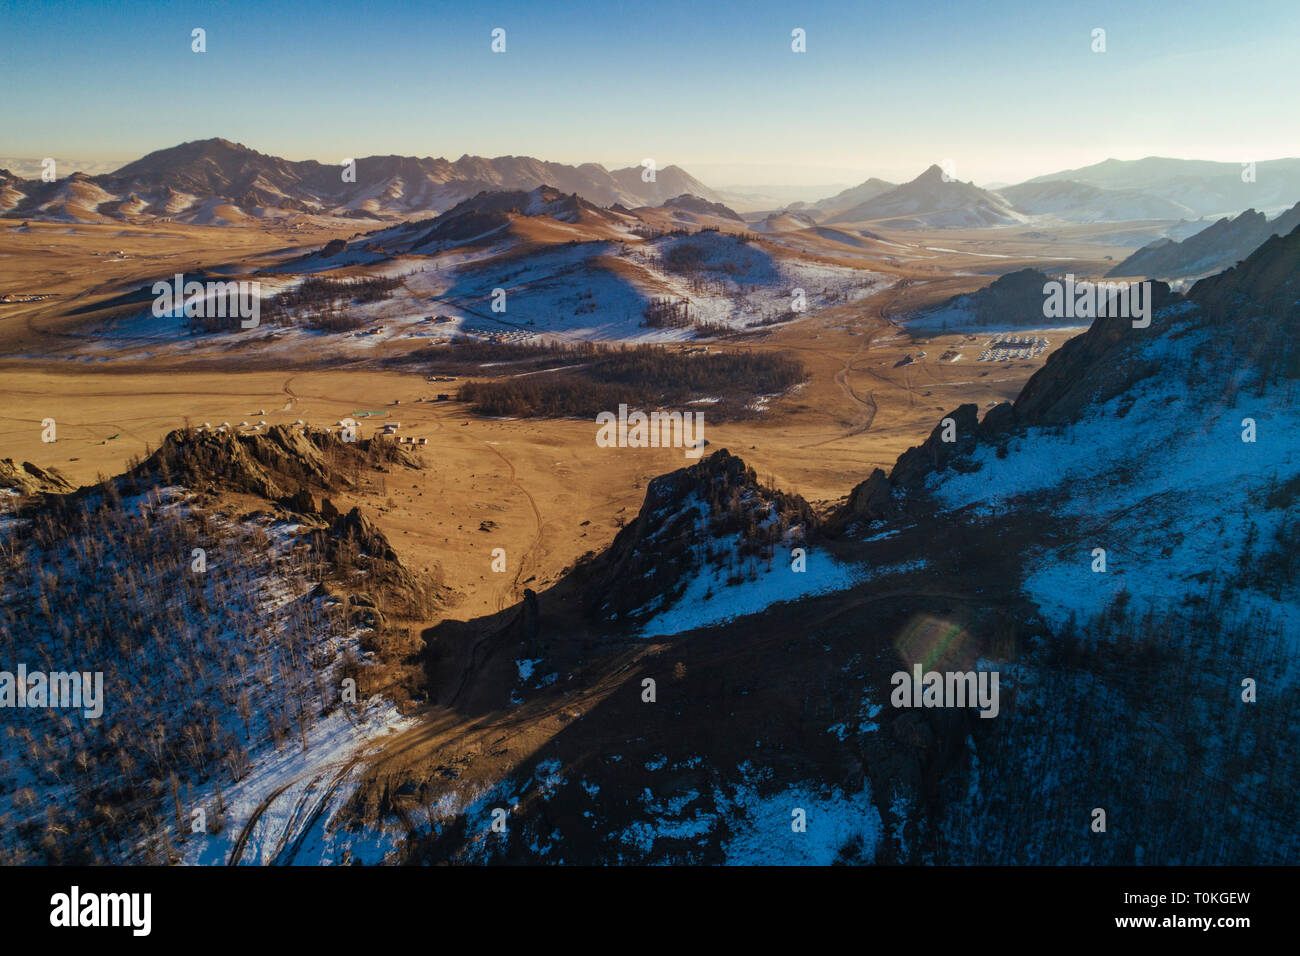 Suiza mongol, Gorkhi-Terelj Parque Nacional, Mongolia Foto de stock